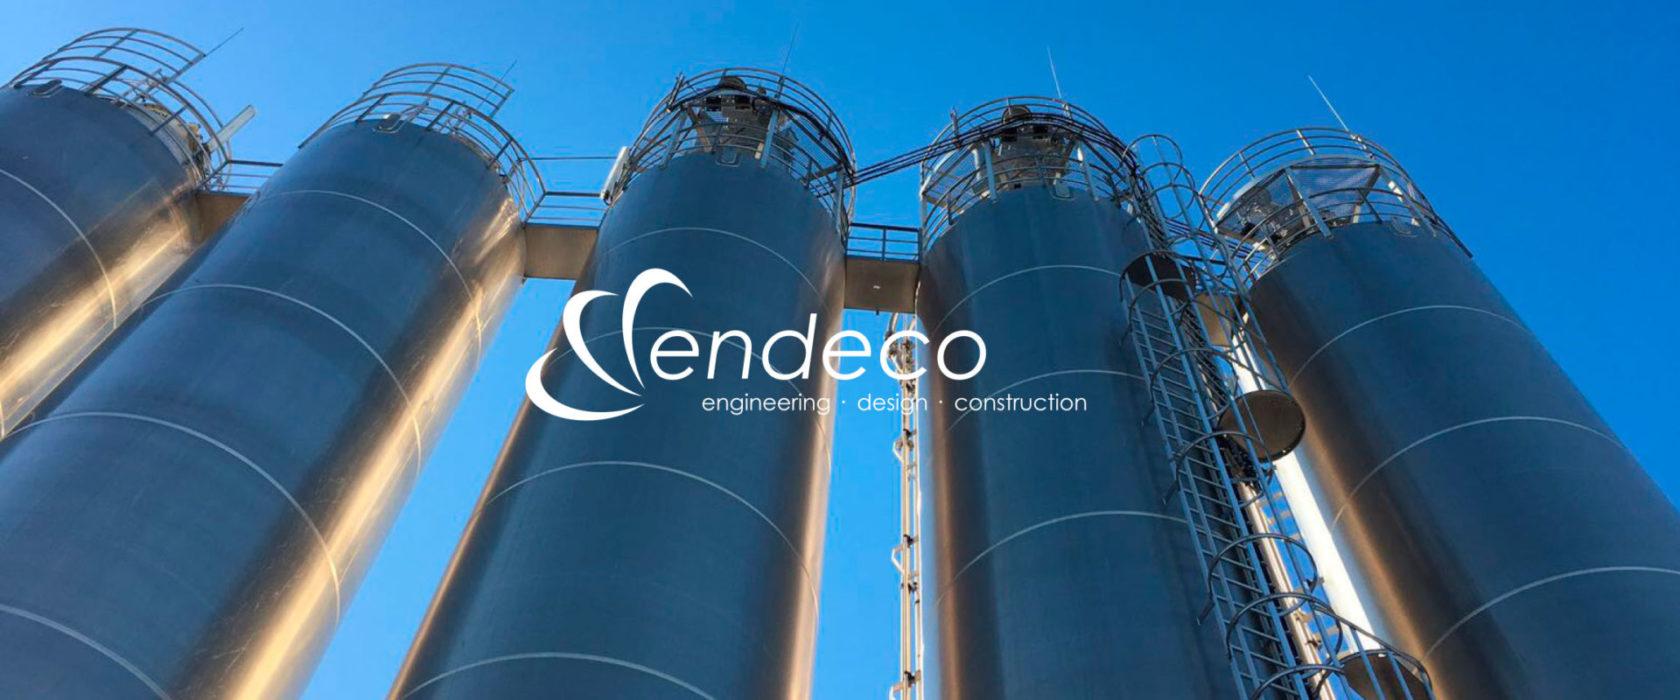 Endeco Anlagenbau Engineering Konstruktionstechnik Anlagenbauer